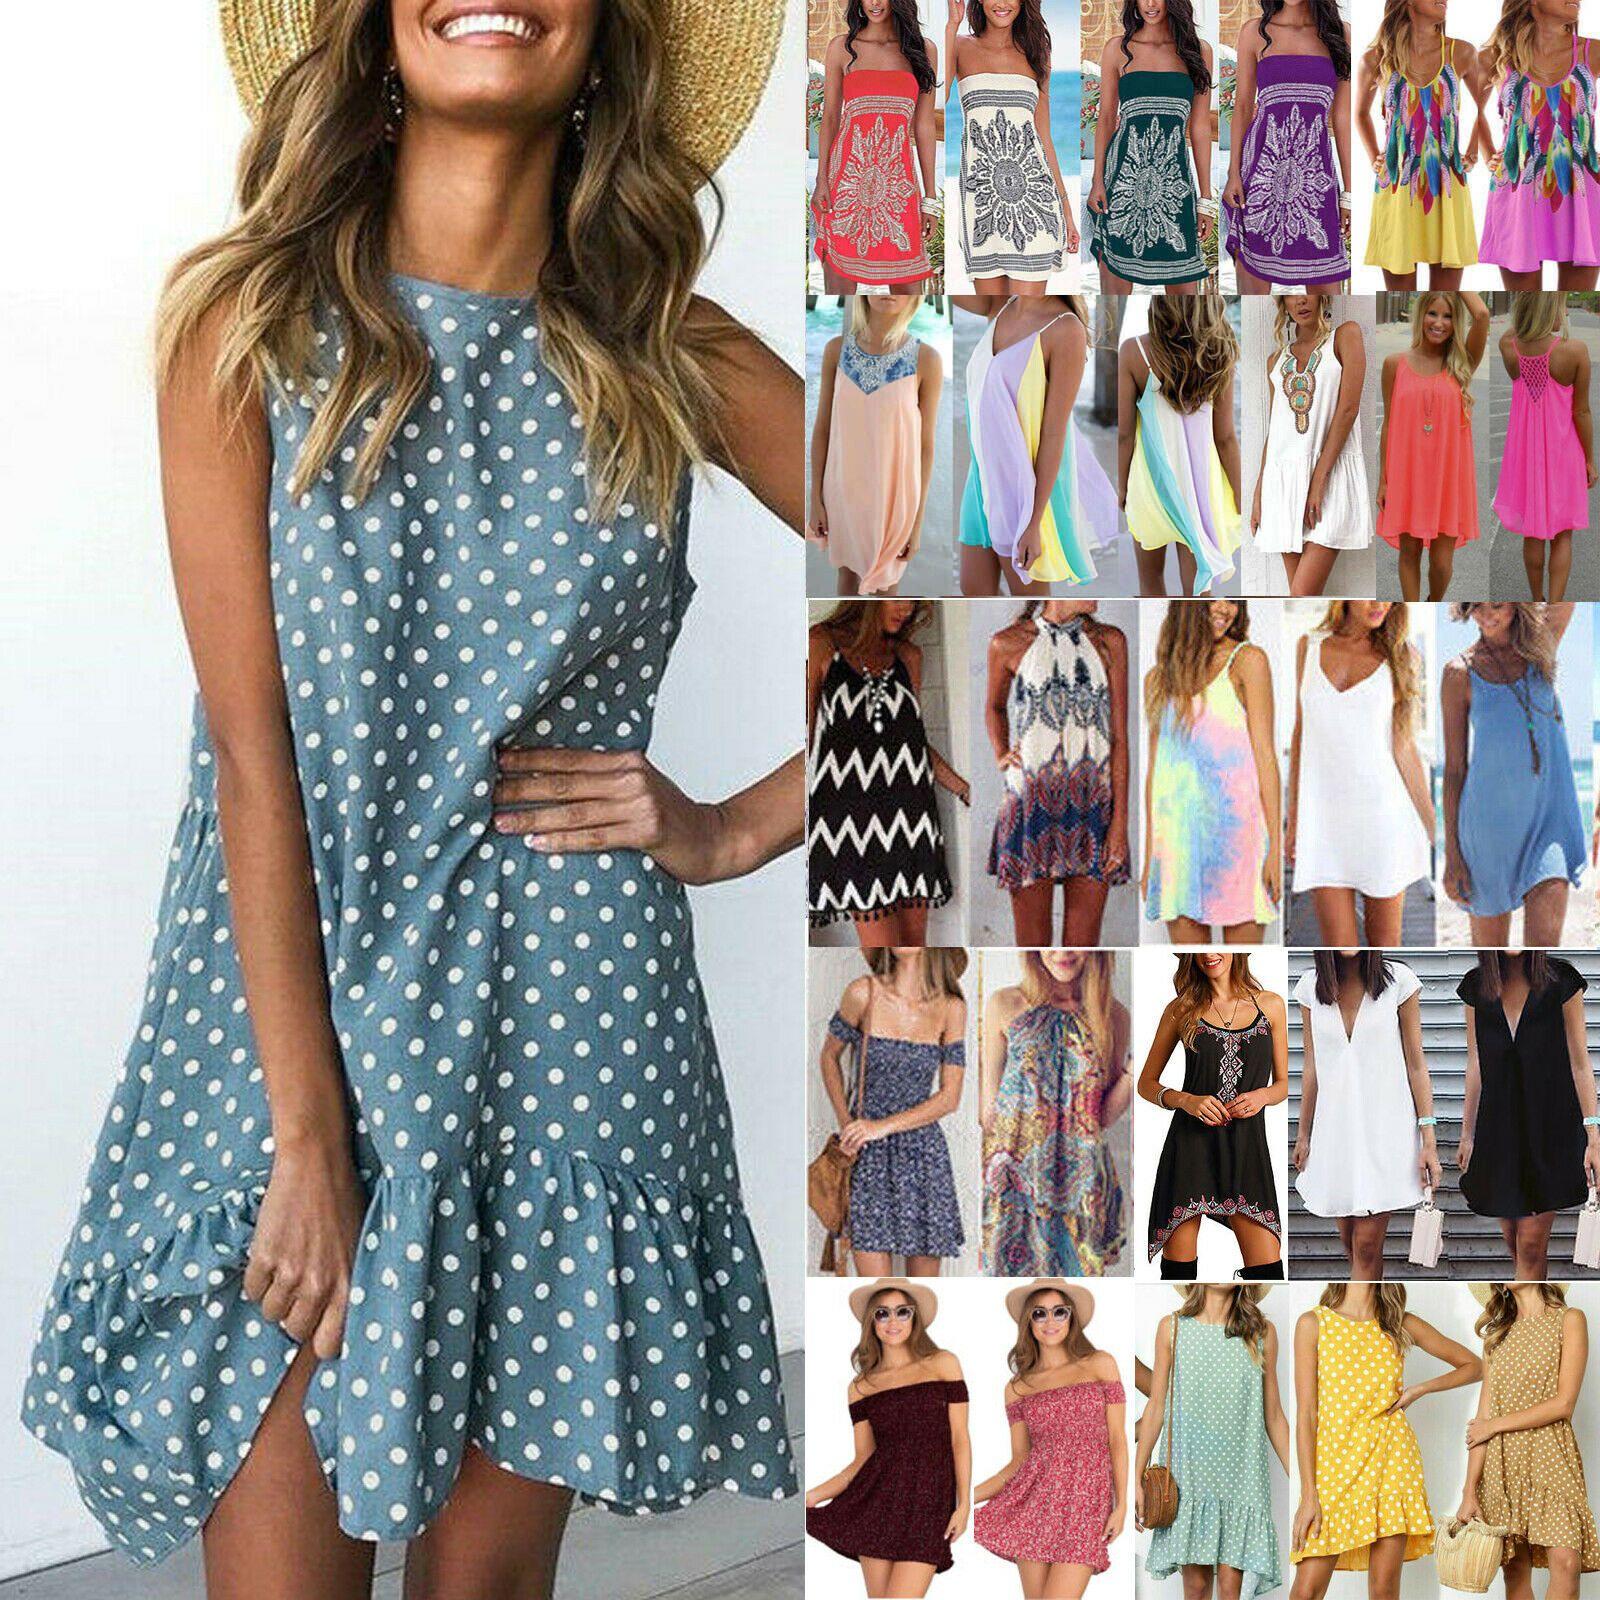 Damen Sommer Boho Kleid Trägerkleid Minikleid Party Abend Ballkleid Strandkleid